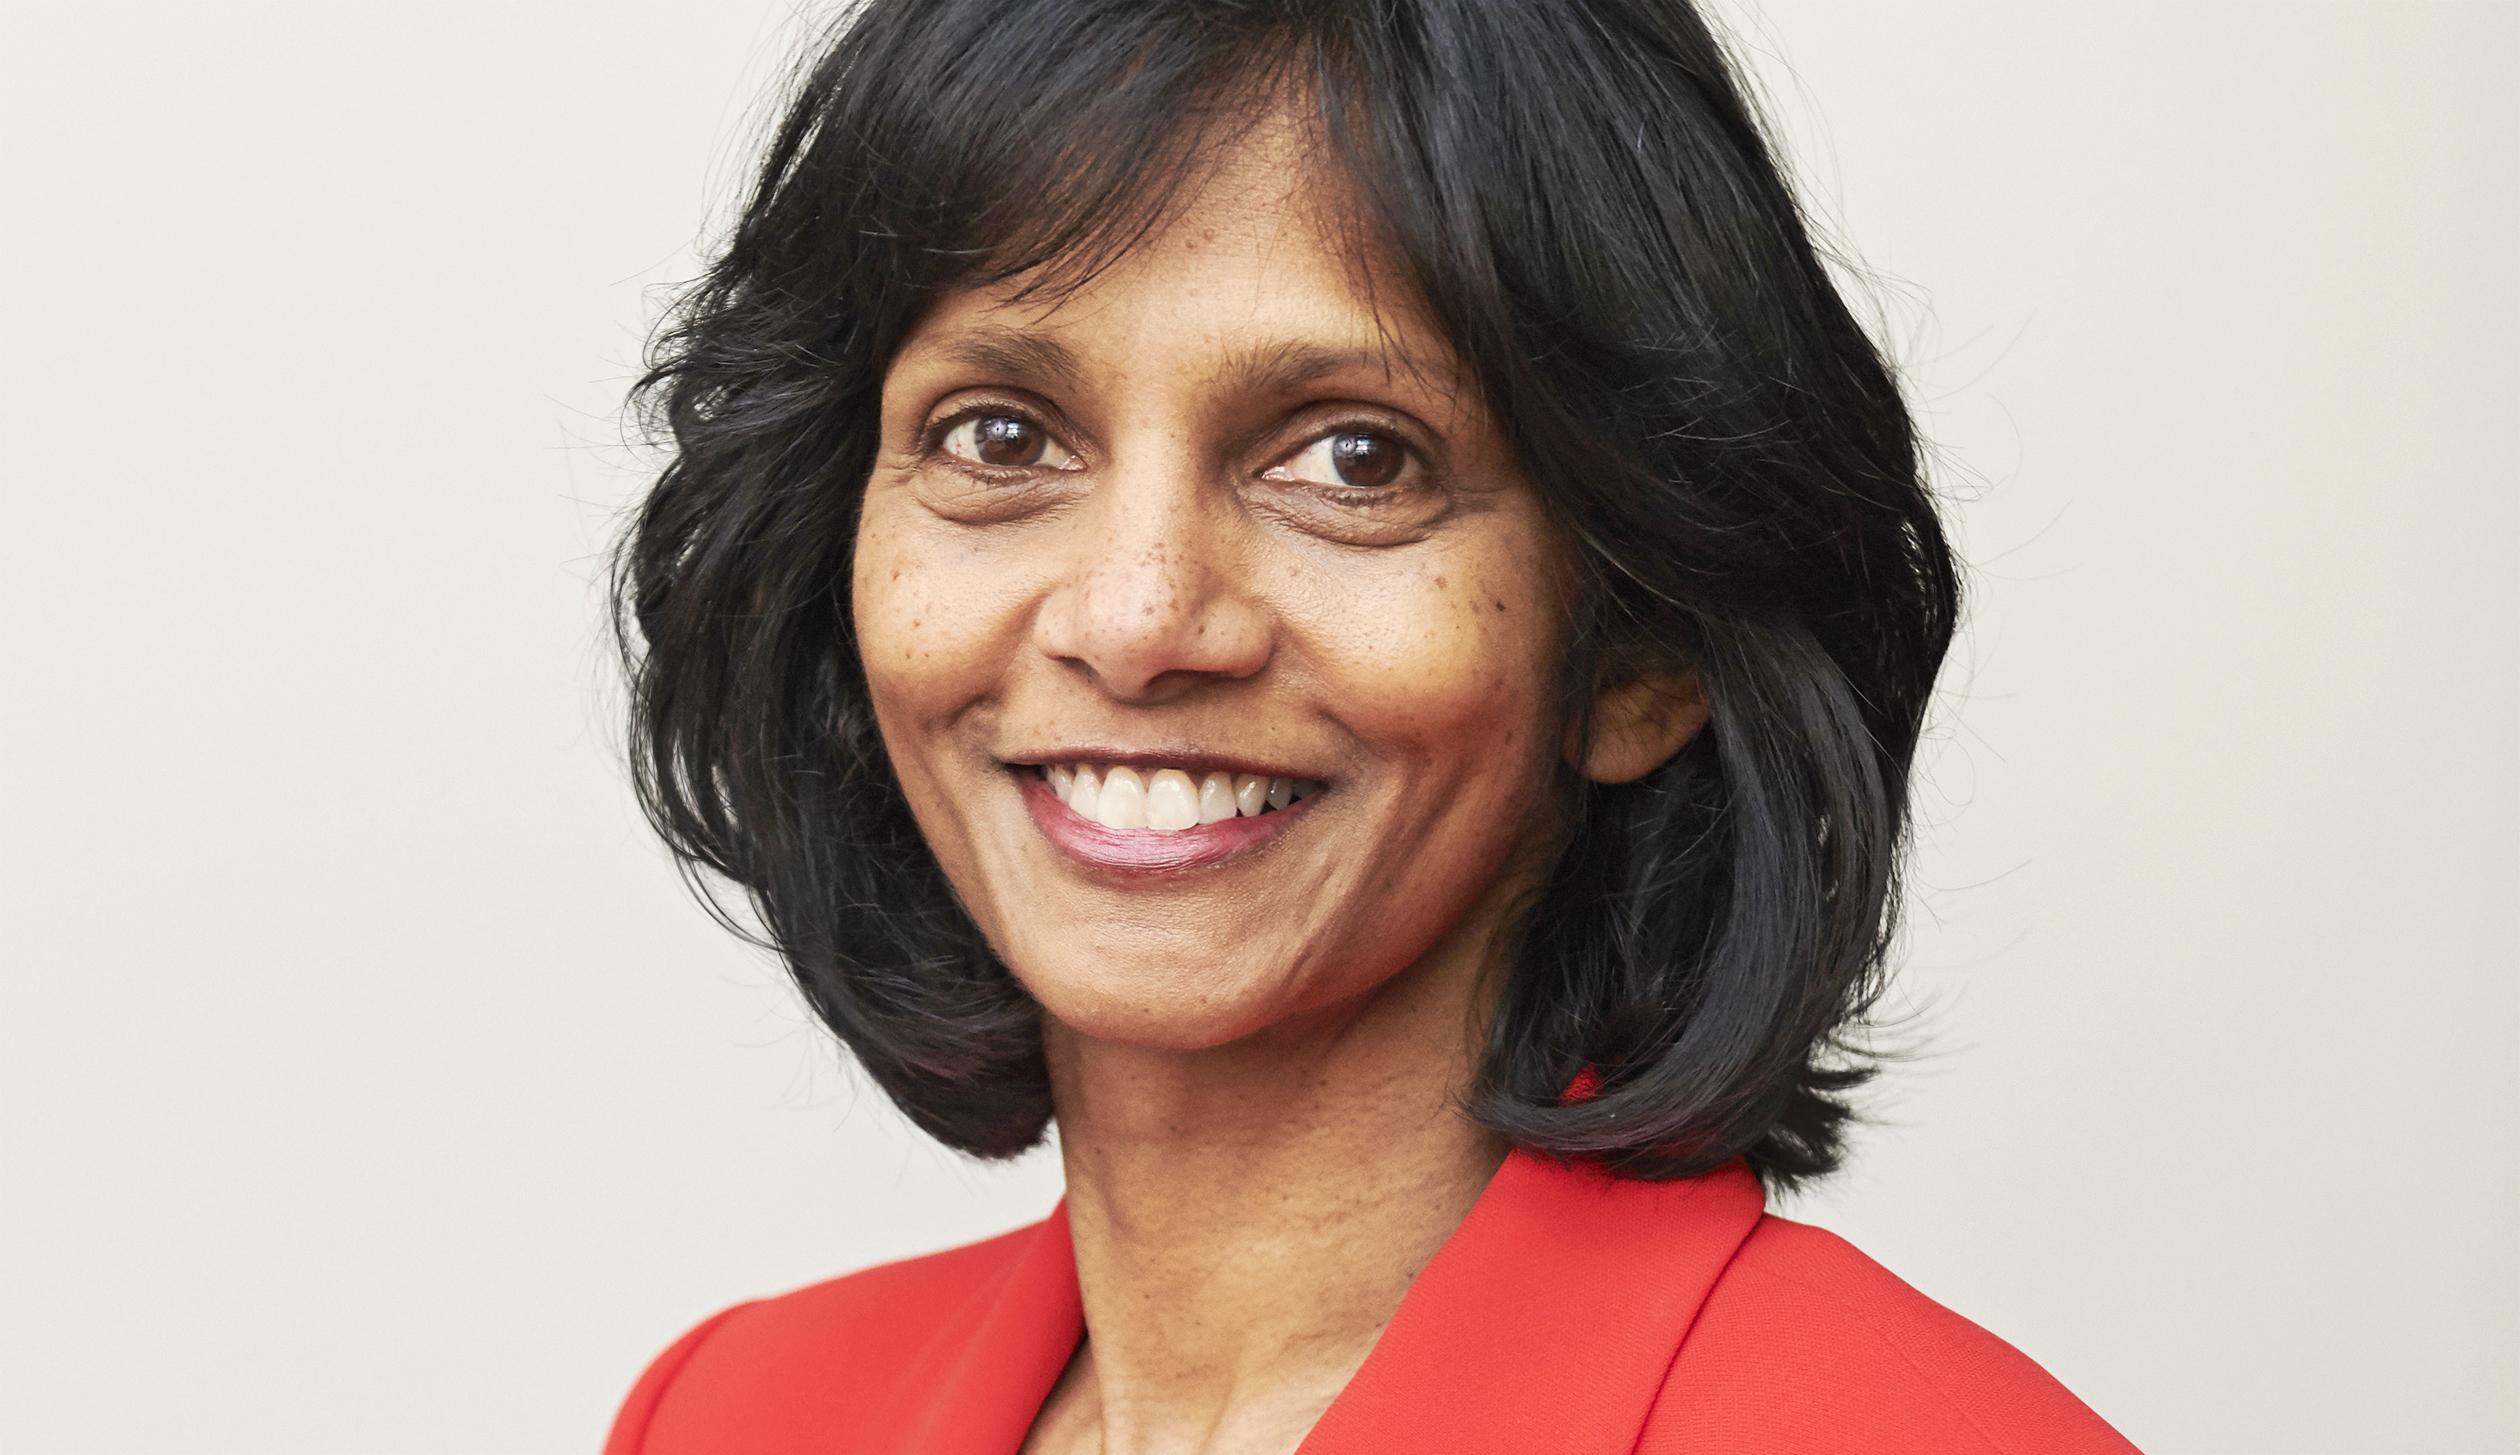 IMPW 2018-Shemara Wikramanayake